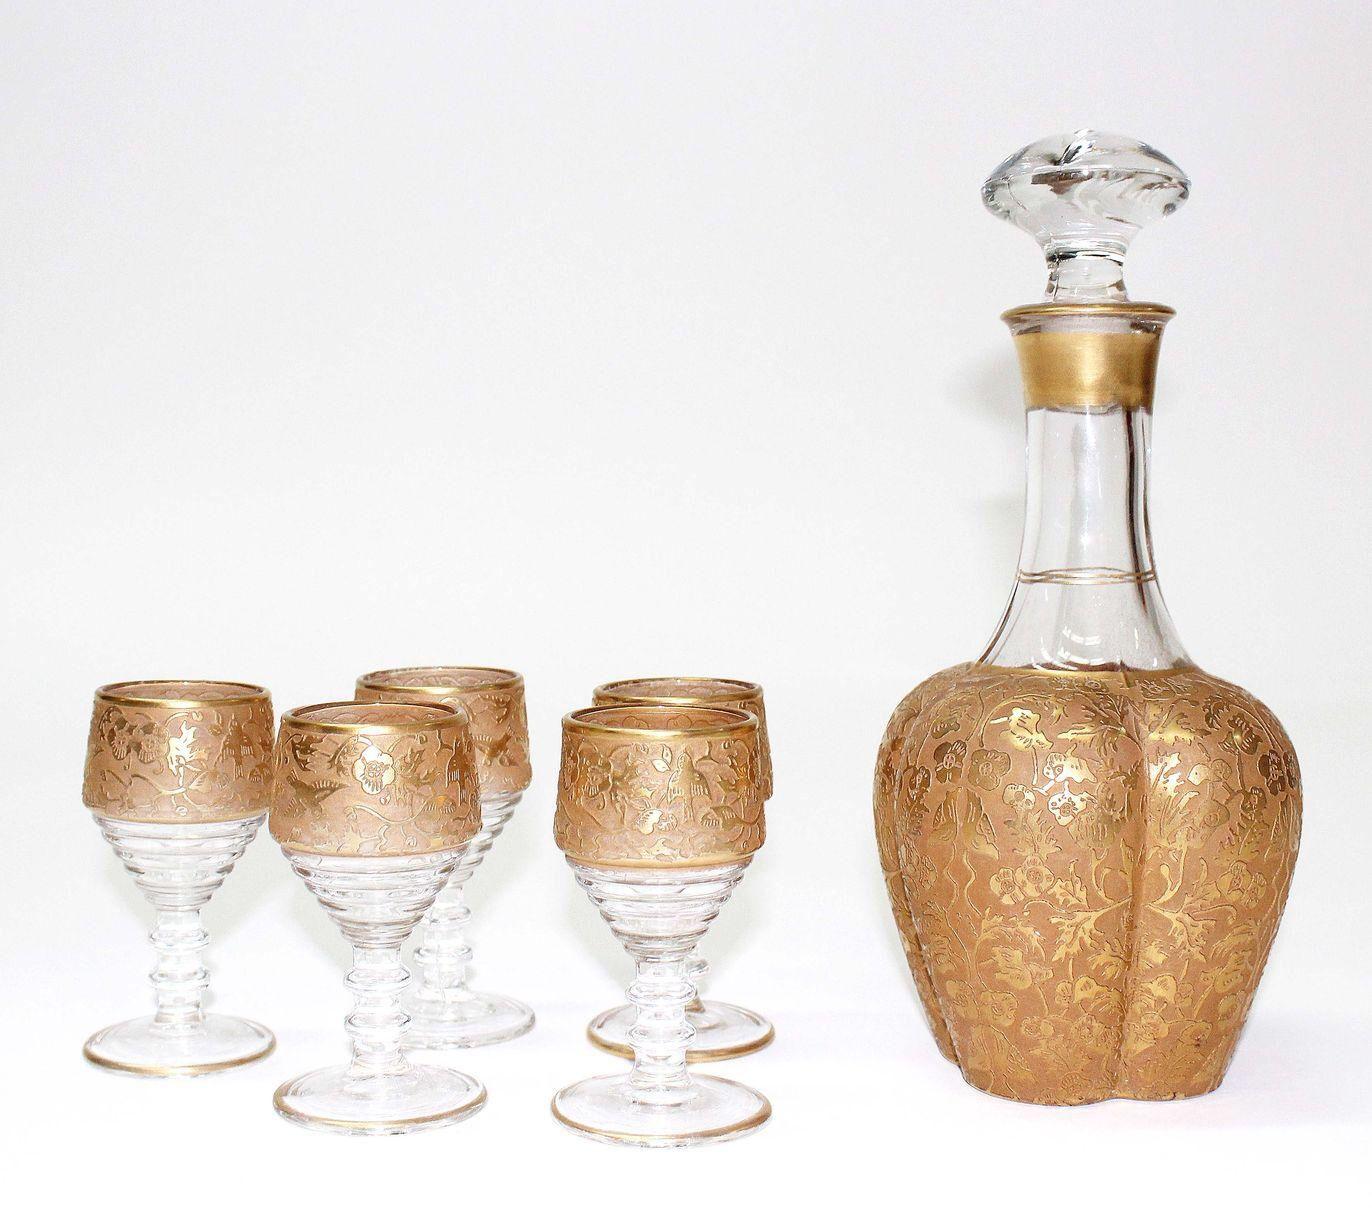 Pin On Bottles Punch Bowels Pitcher Sets Liquor Glasses